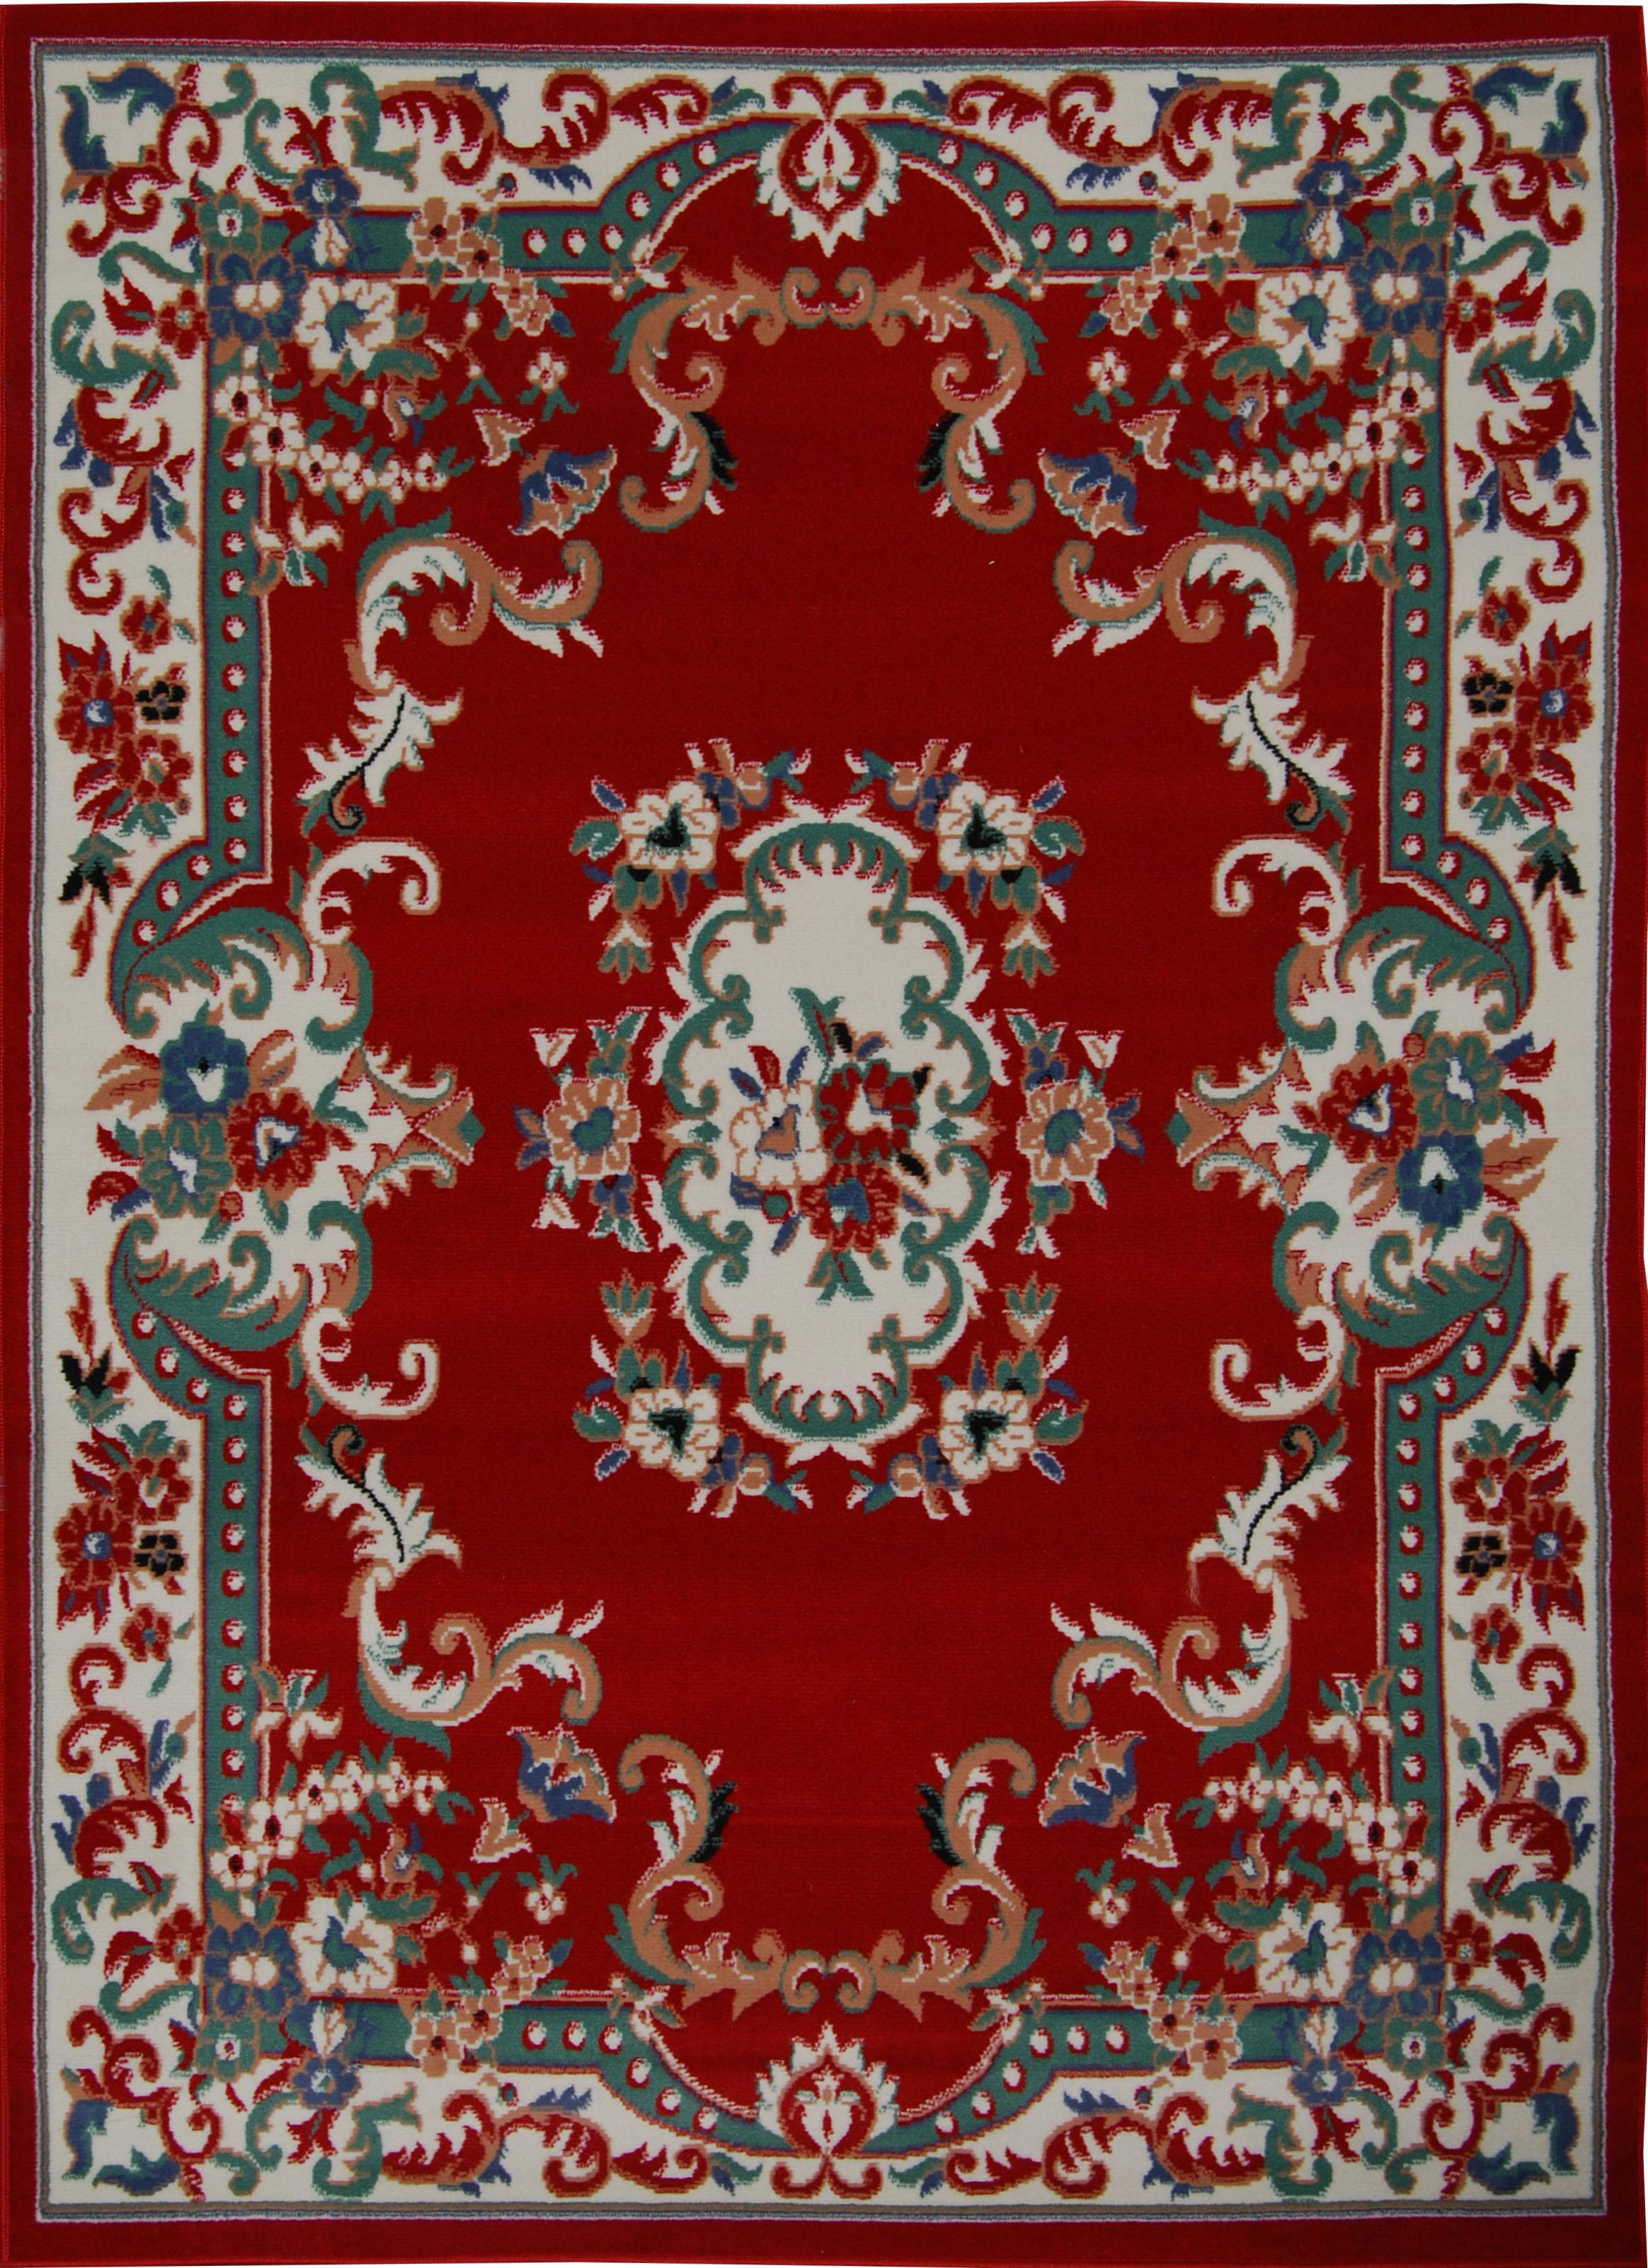 Oriental-Floral-Border-Medallion-Area-Rug-Scrolls-Traditional-Persien-Carpet thumbnail 9